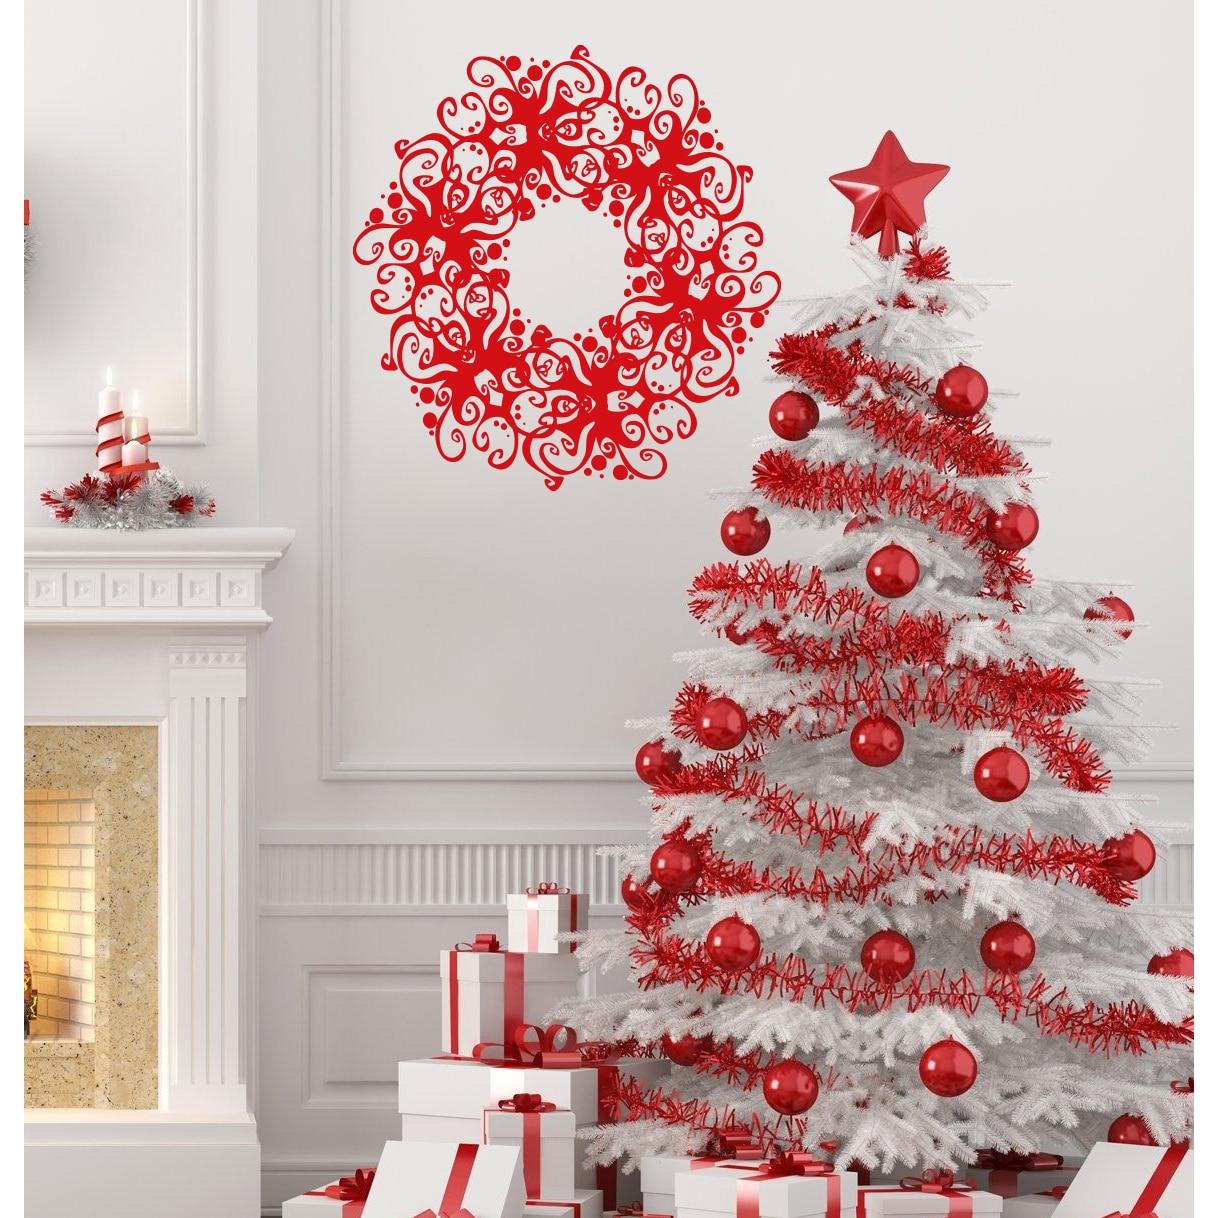 Beautiful Christmas wreath Wall Art Sticker Decal Red (22...